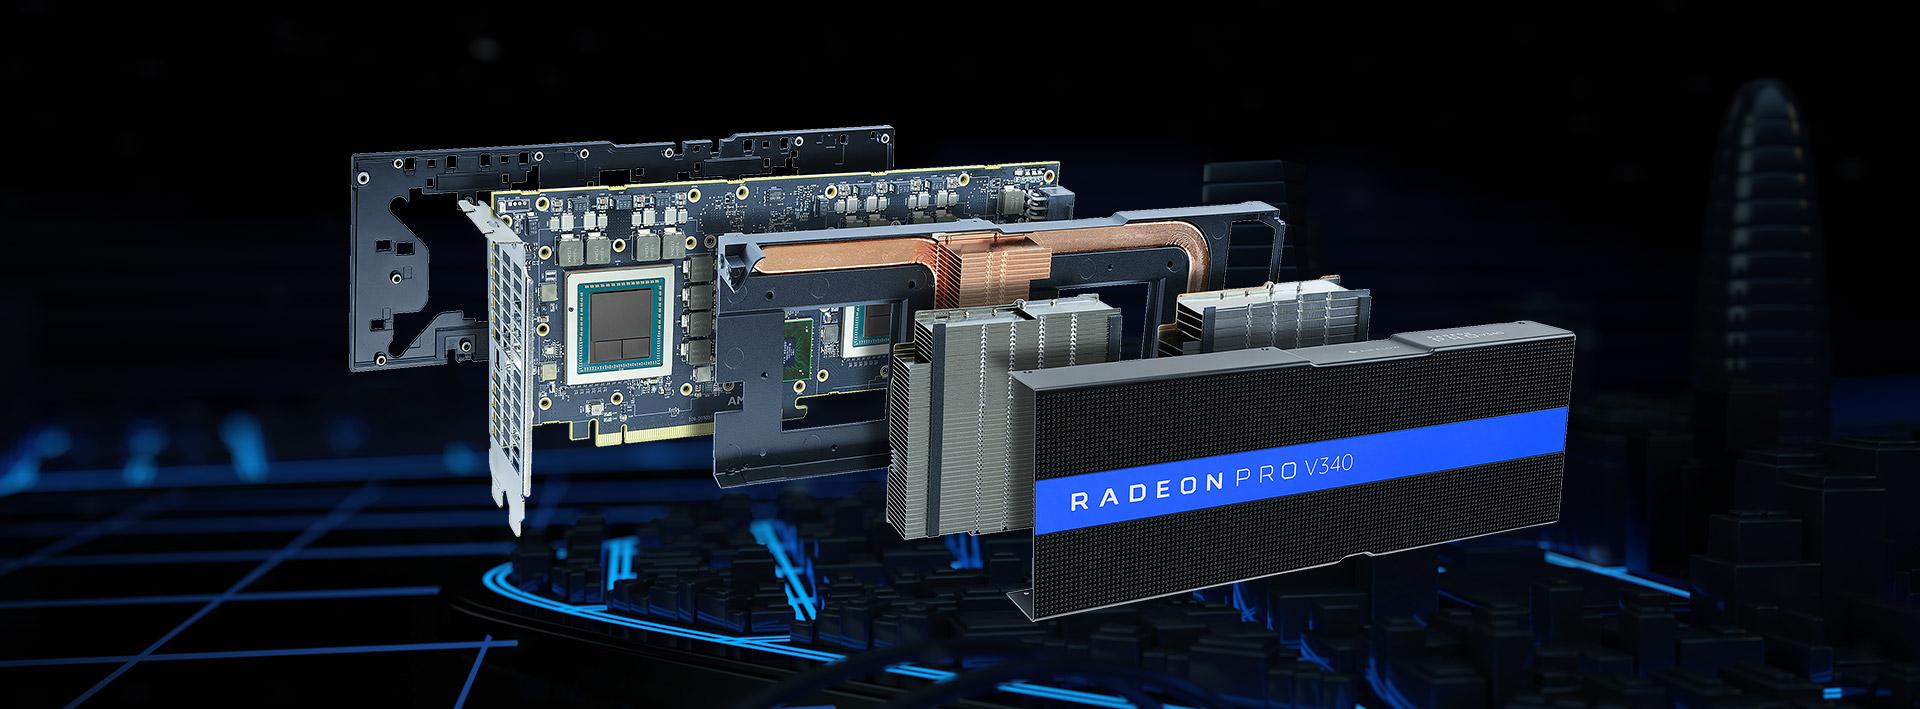 AMD Launches Radeon Pro V340 With Dual Vega 56 GPUs, 32 GB HBM2